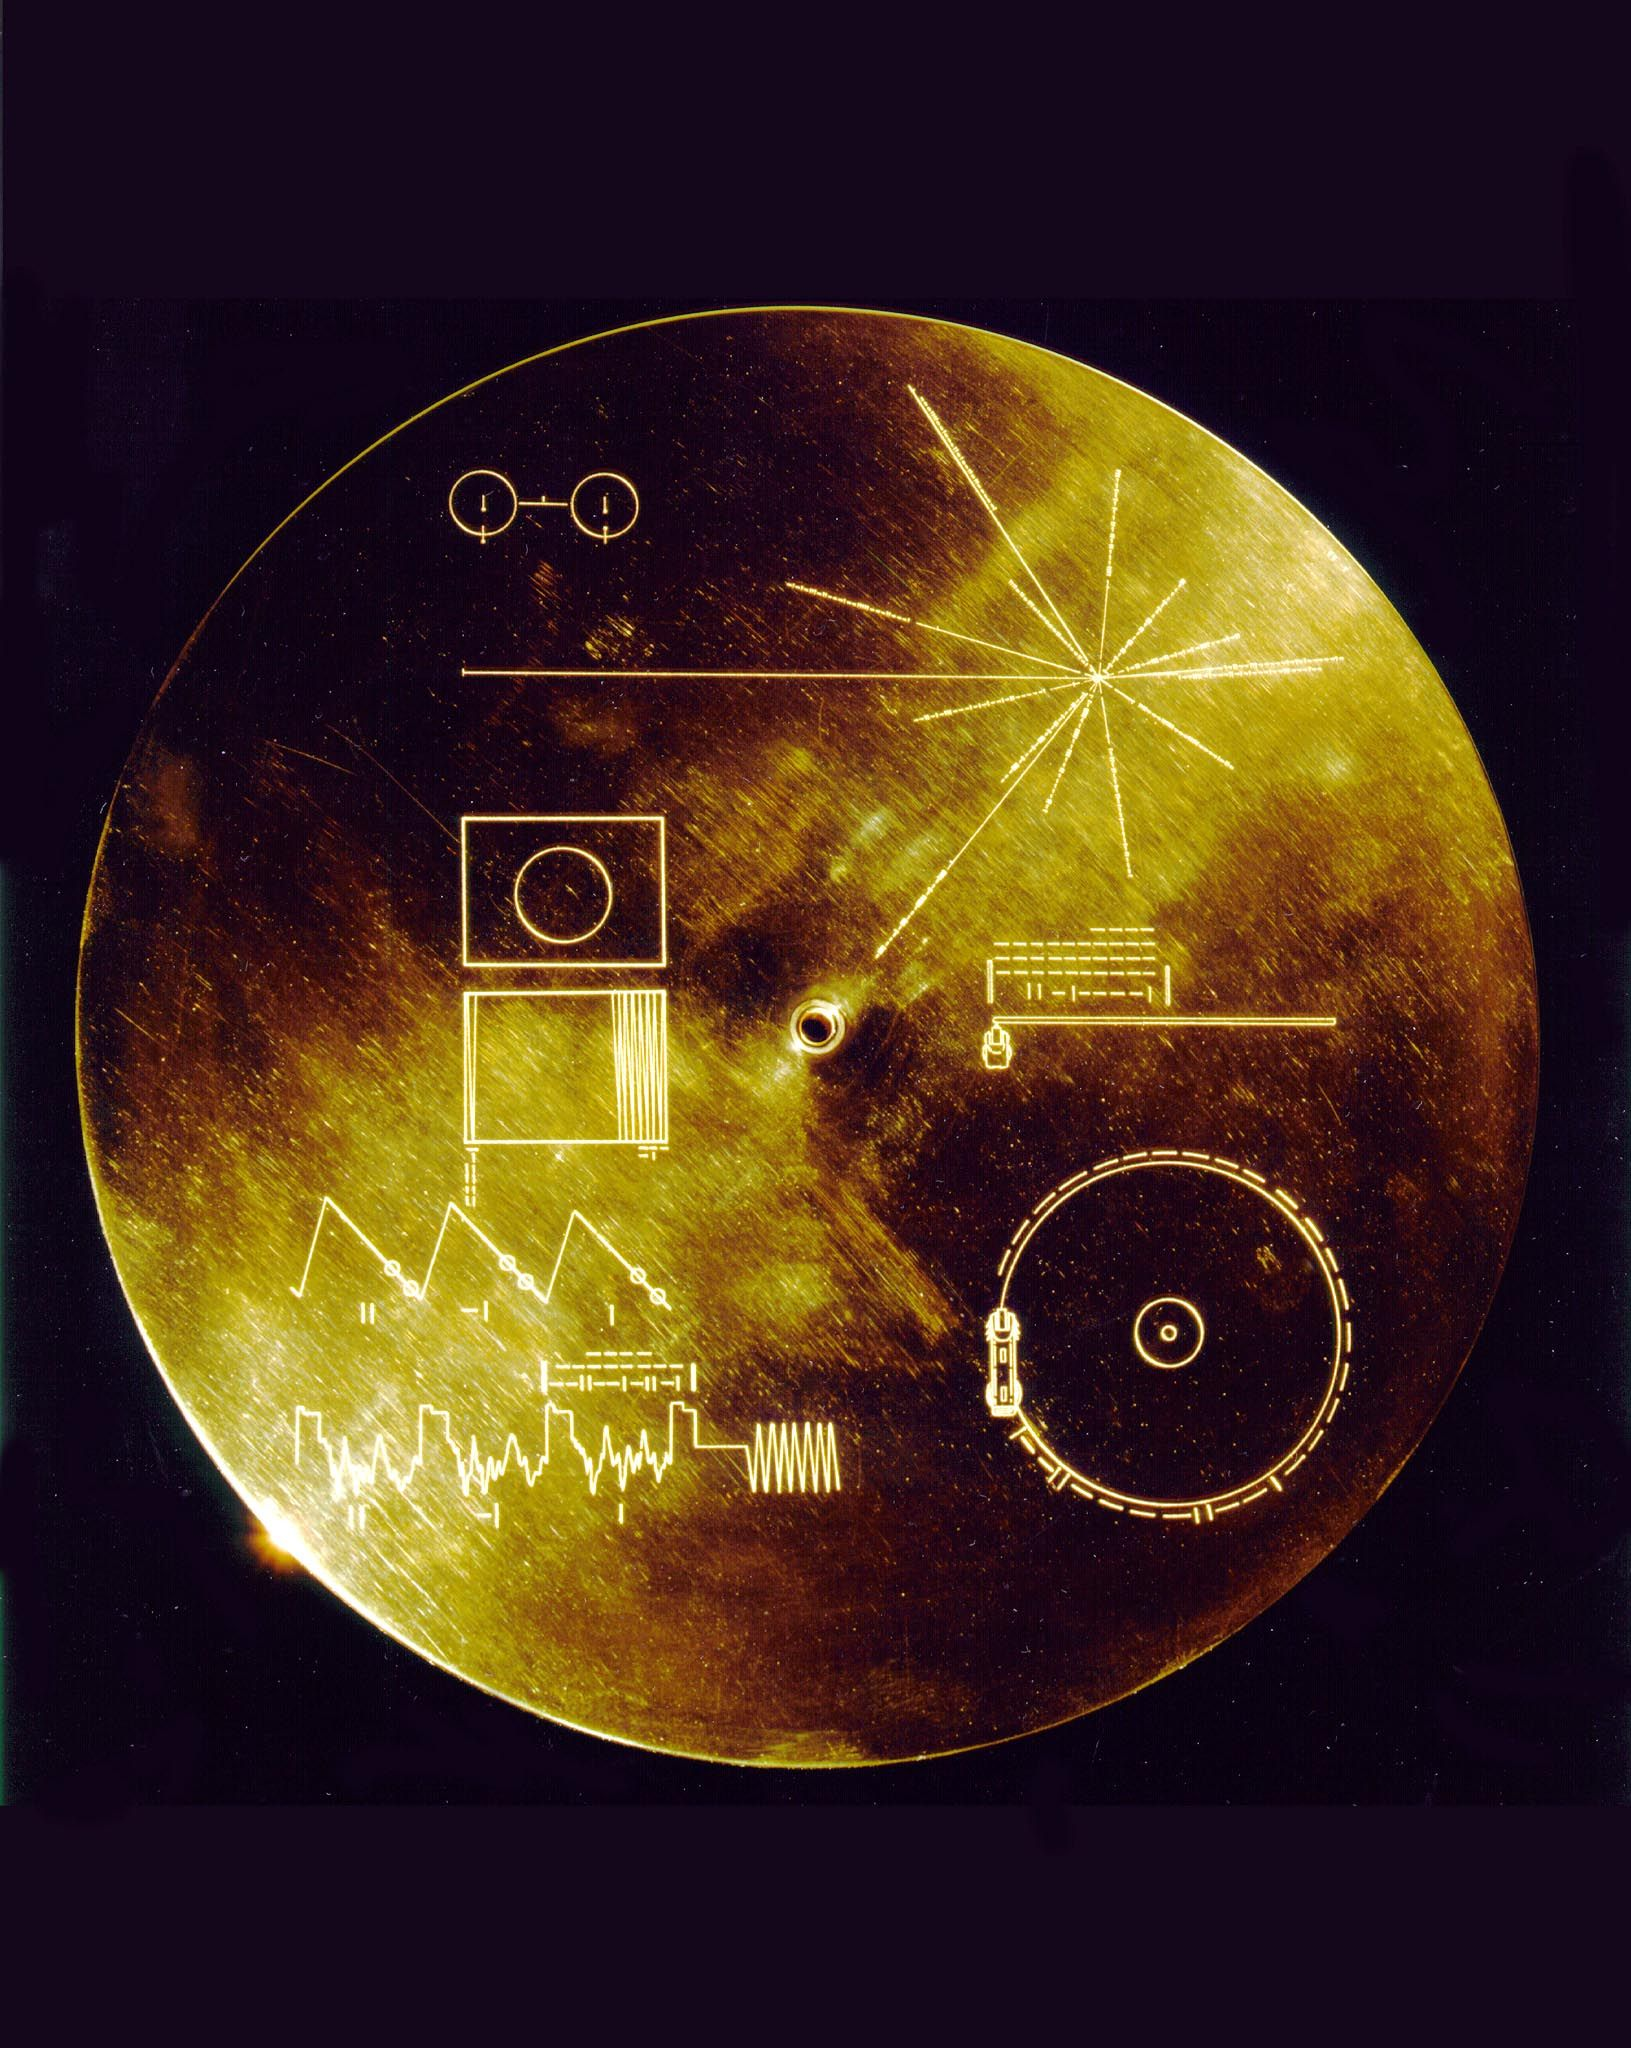 Les Sons Venus De La Terre Que Les Extraterrestres Ont Peut Etre Entendu Extraterrestres Extraterrestre Nasa